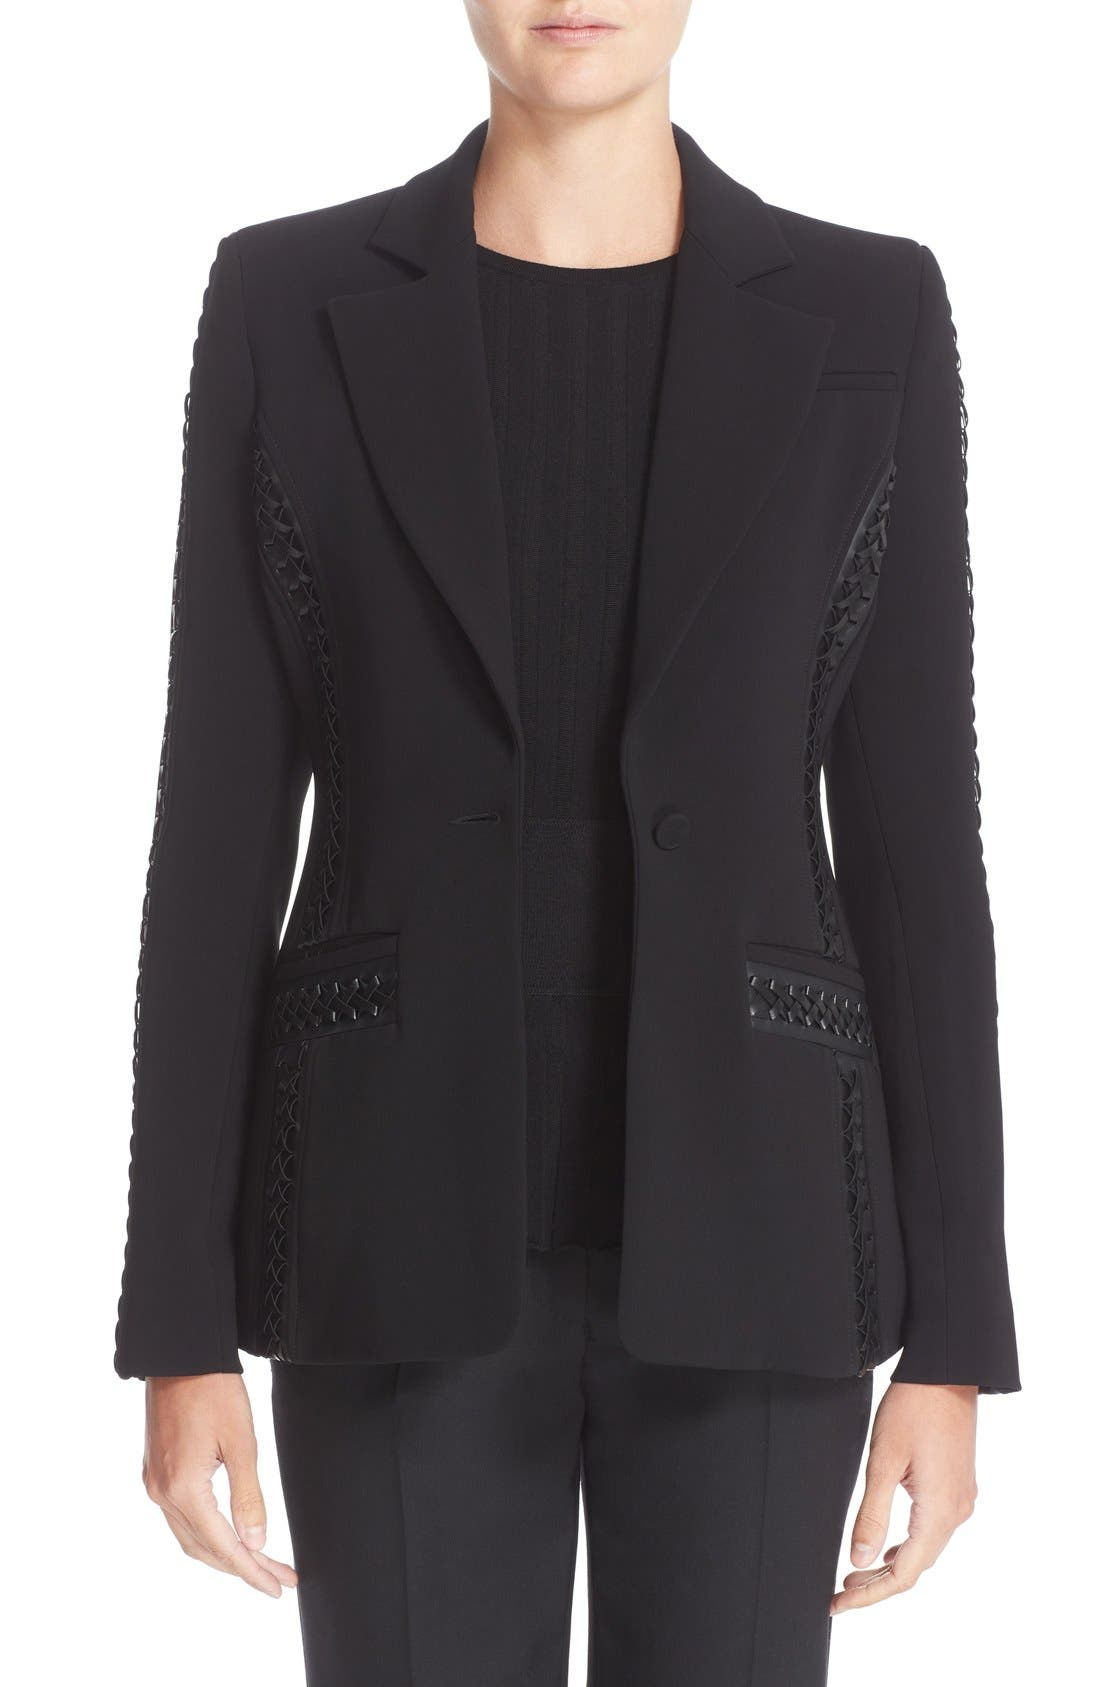 Altuzarra Acacia Lace Detail Jacket